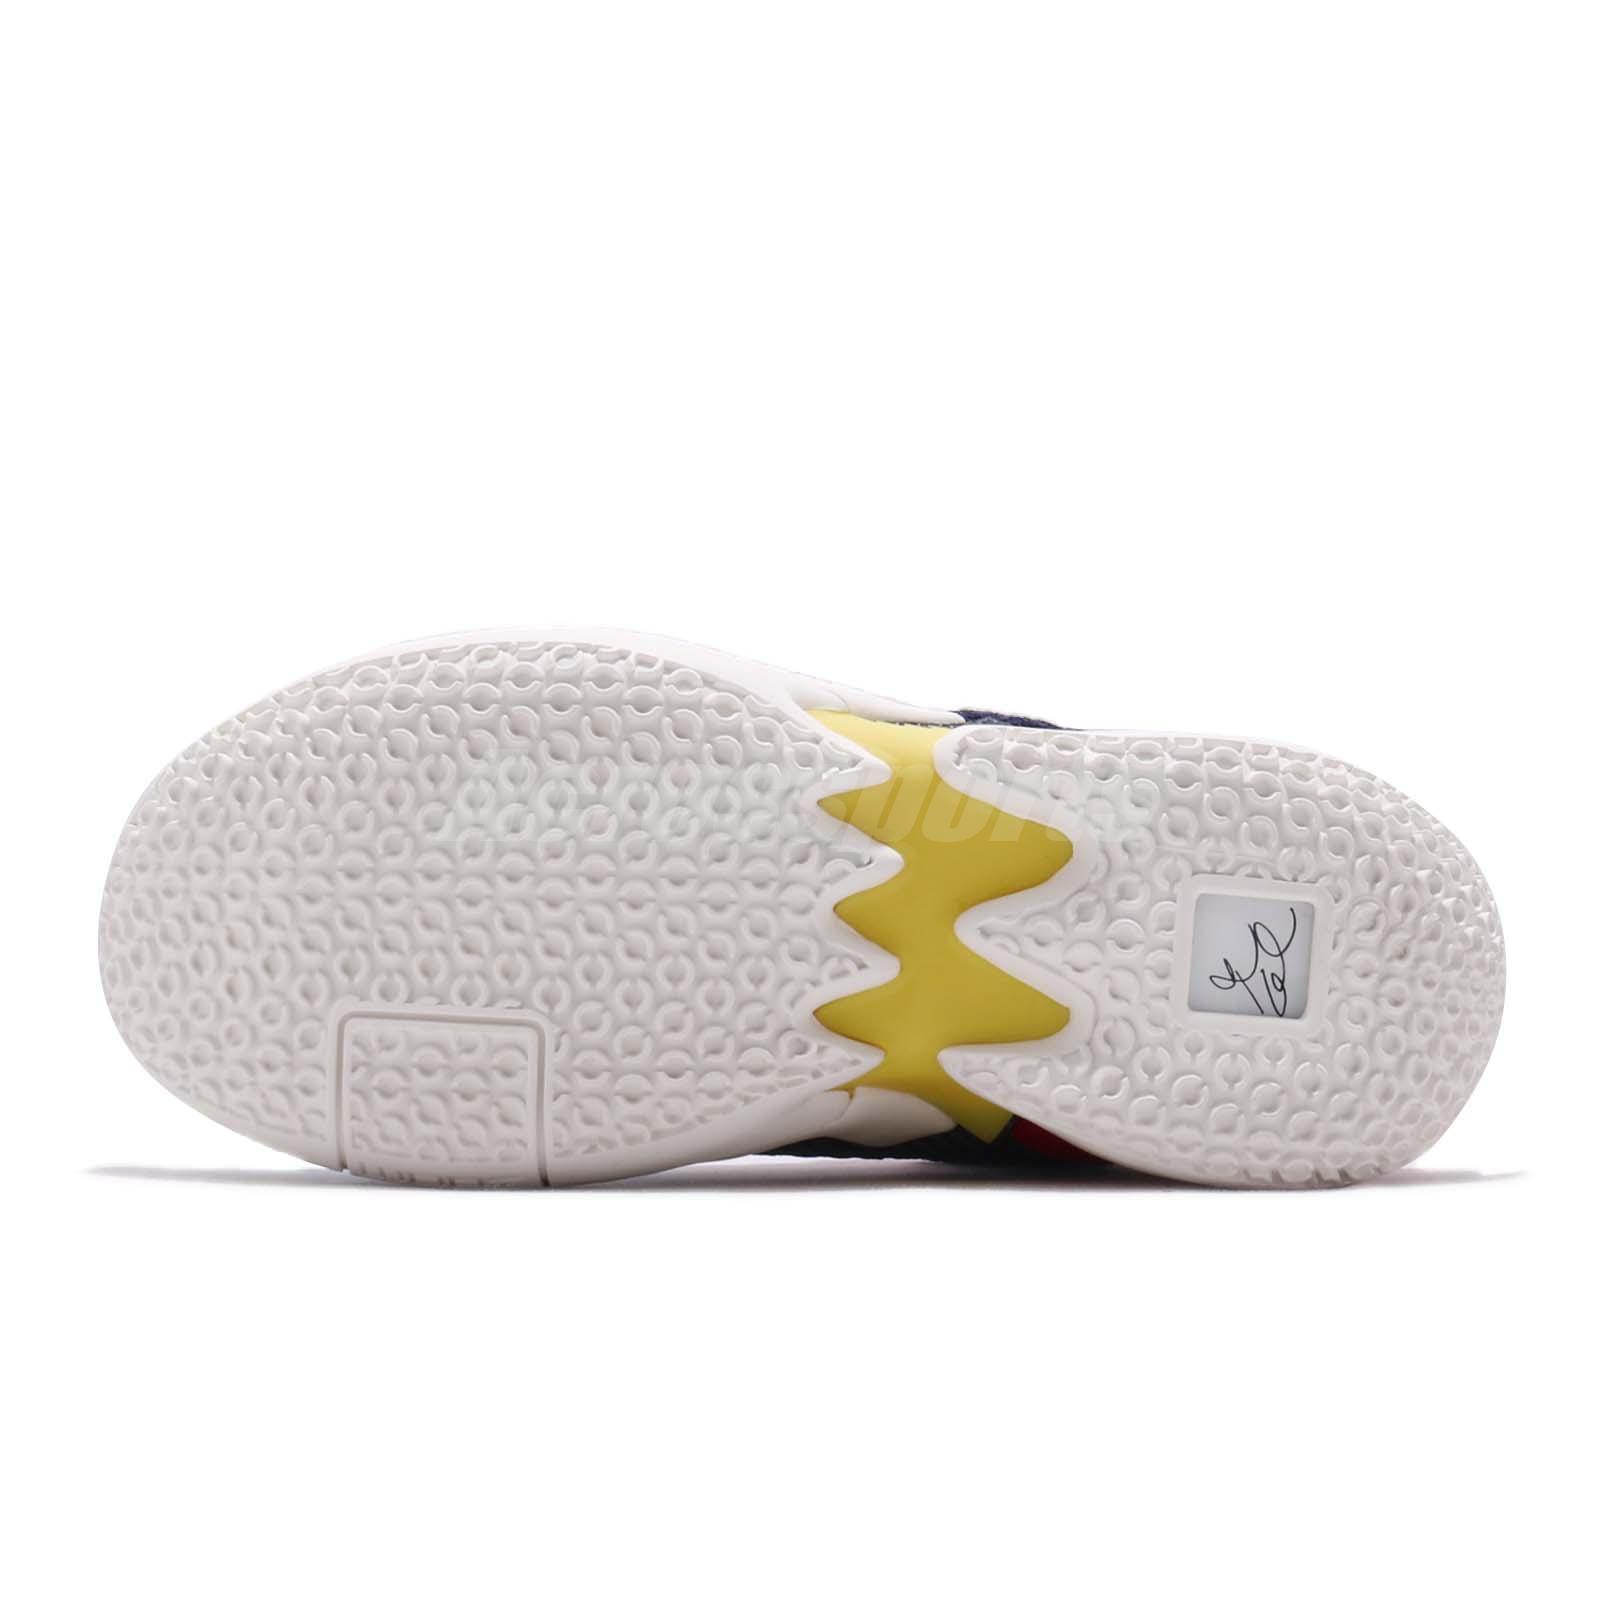 Nike Jordan Why Not Zer0.2 Gs Multi-color Russell Westbrook Kid Women Ao6218-900 Women's Shoes